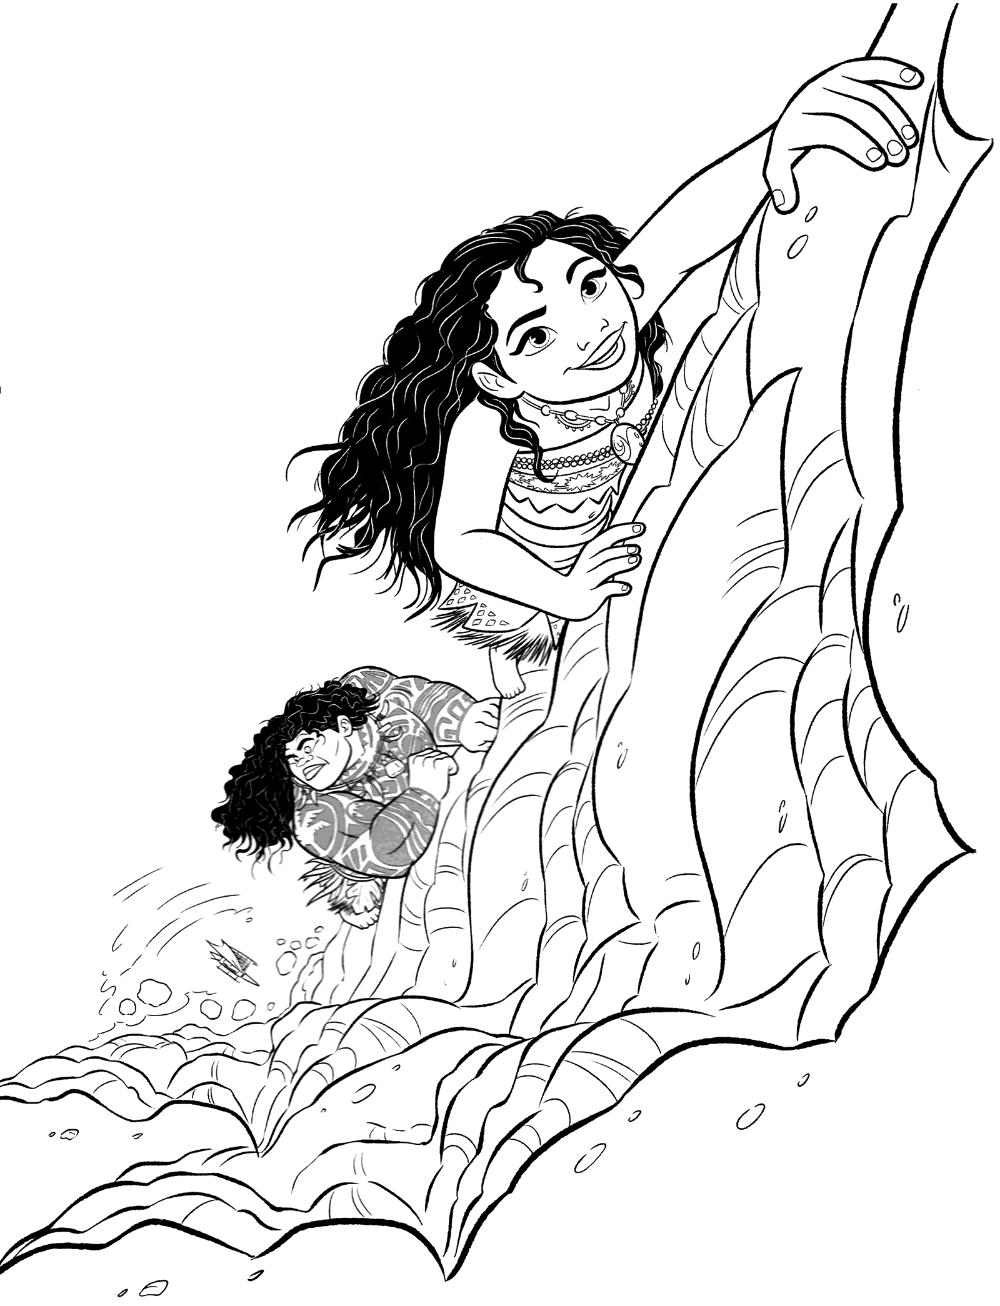 Free Moana Coloring Book Educative Printable Moana Coloring Moana Coloring Pages Coloring Pages [ 1306 x 1000 Pixel ]